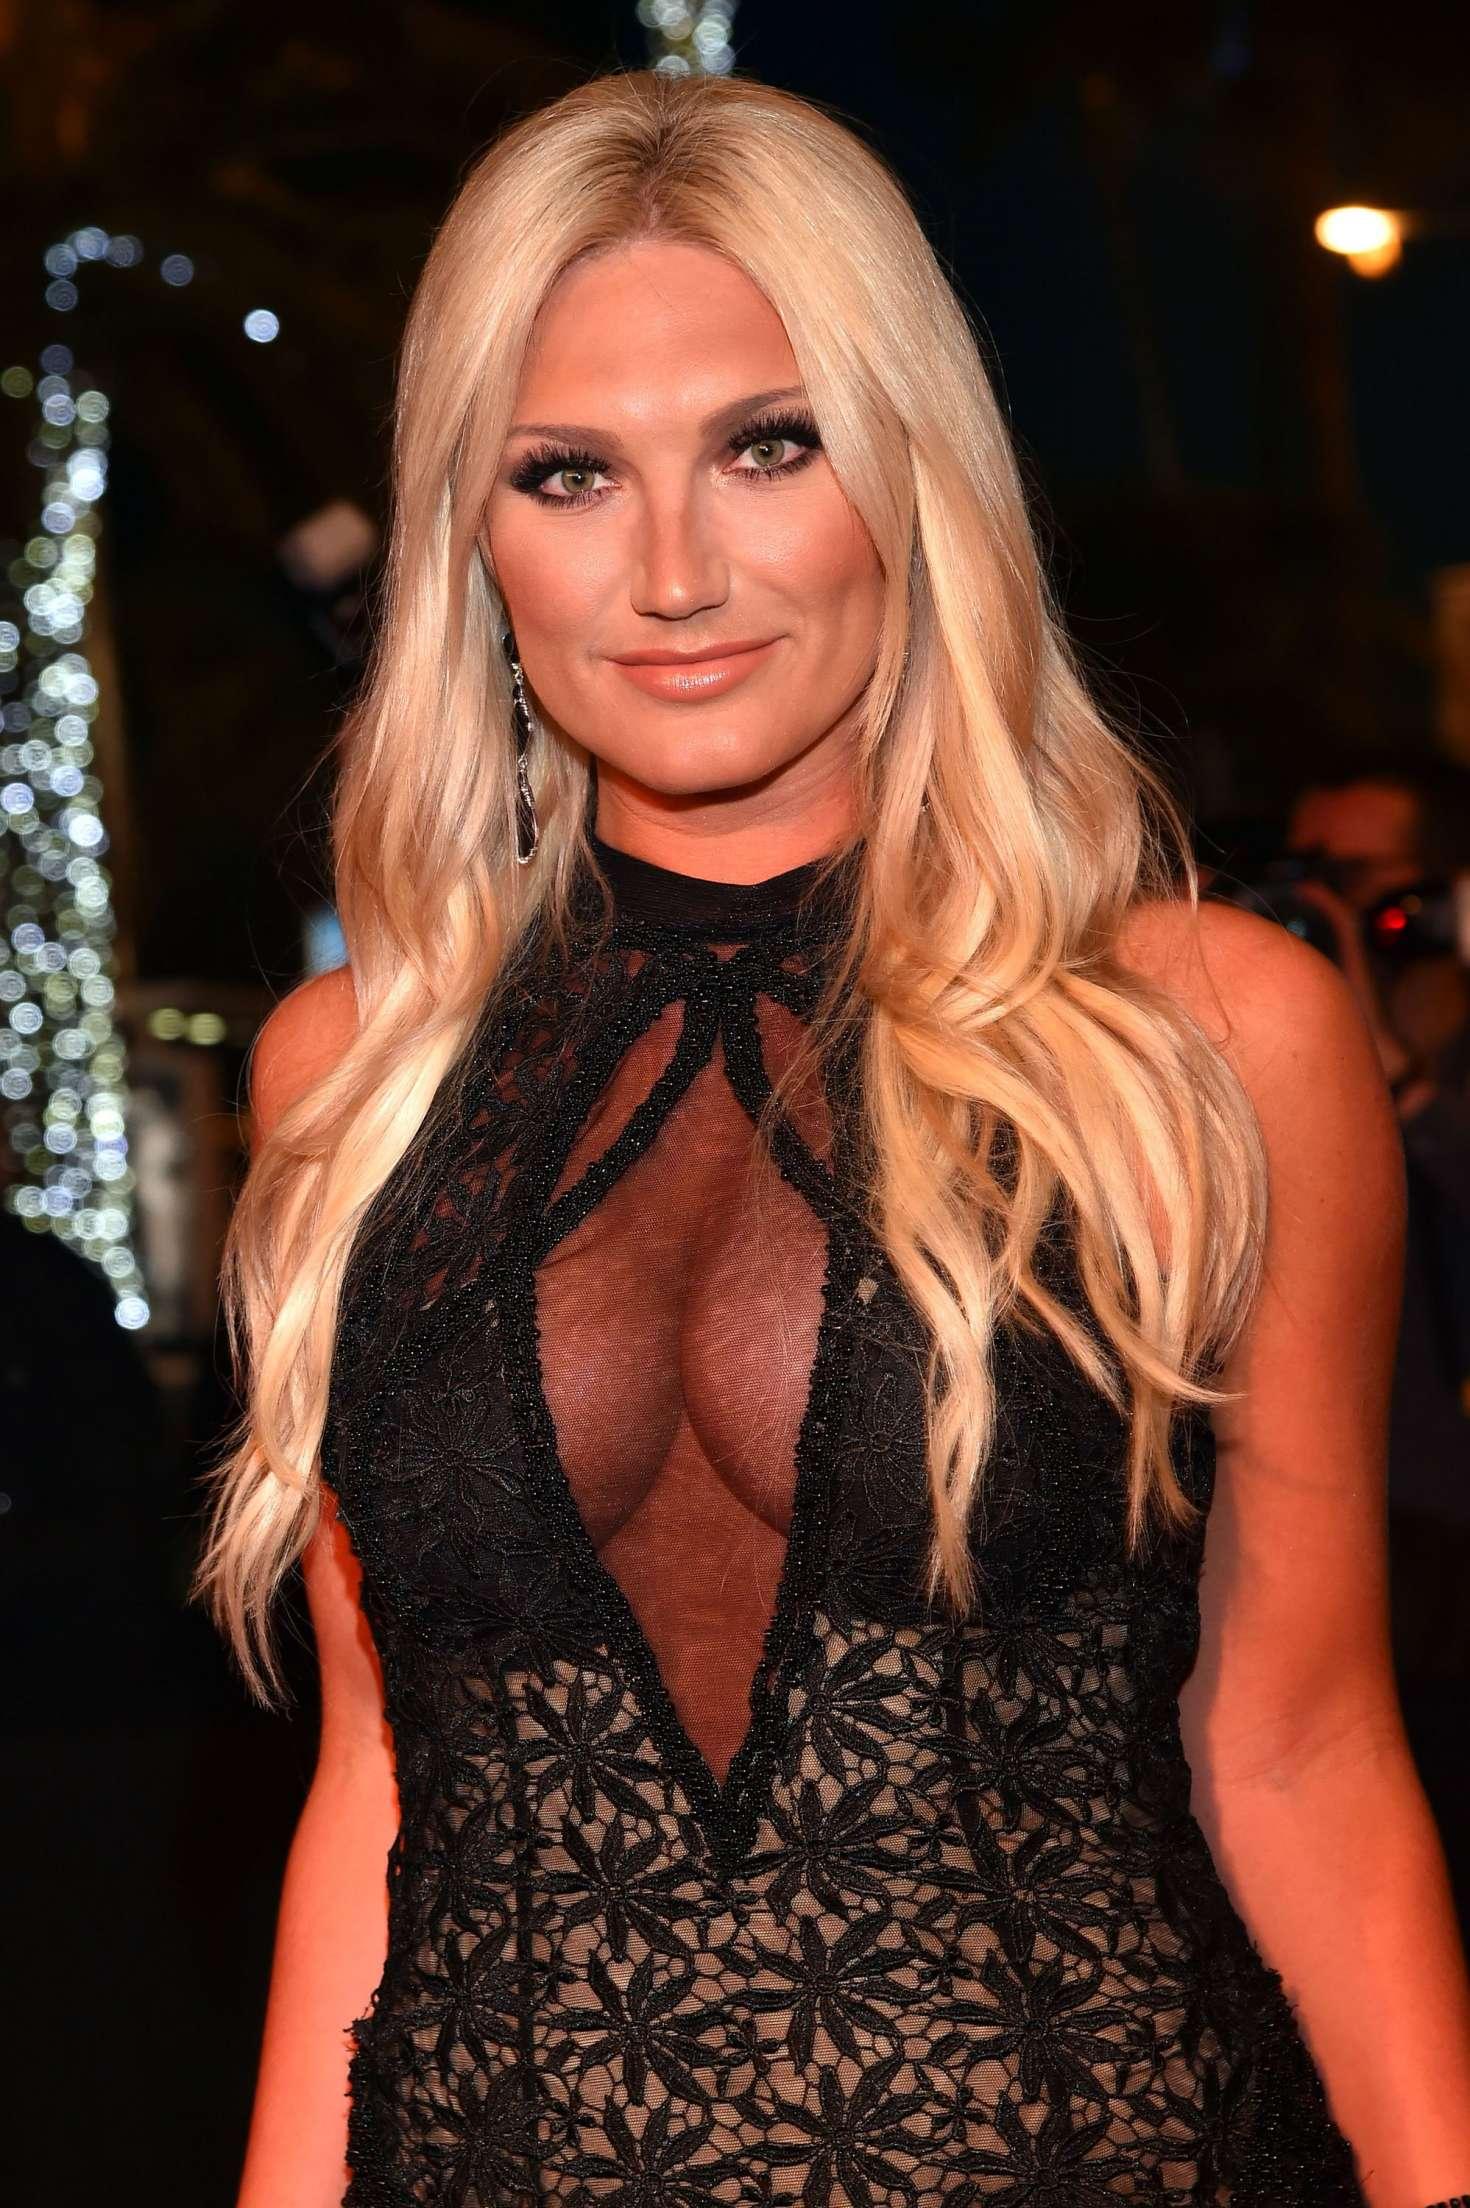 Brooke Hogan - MIPTV 2017 Gala in Cannes